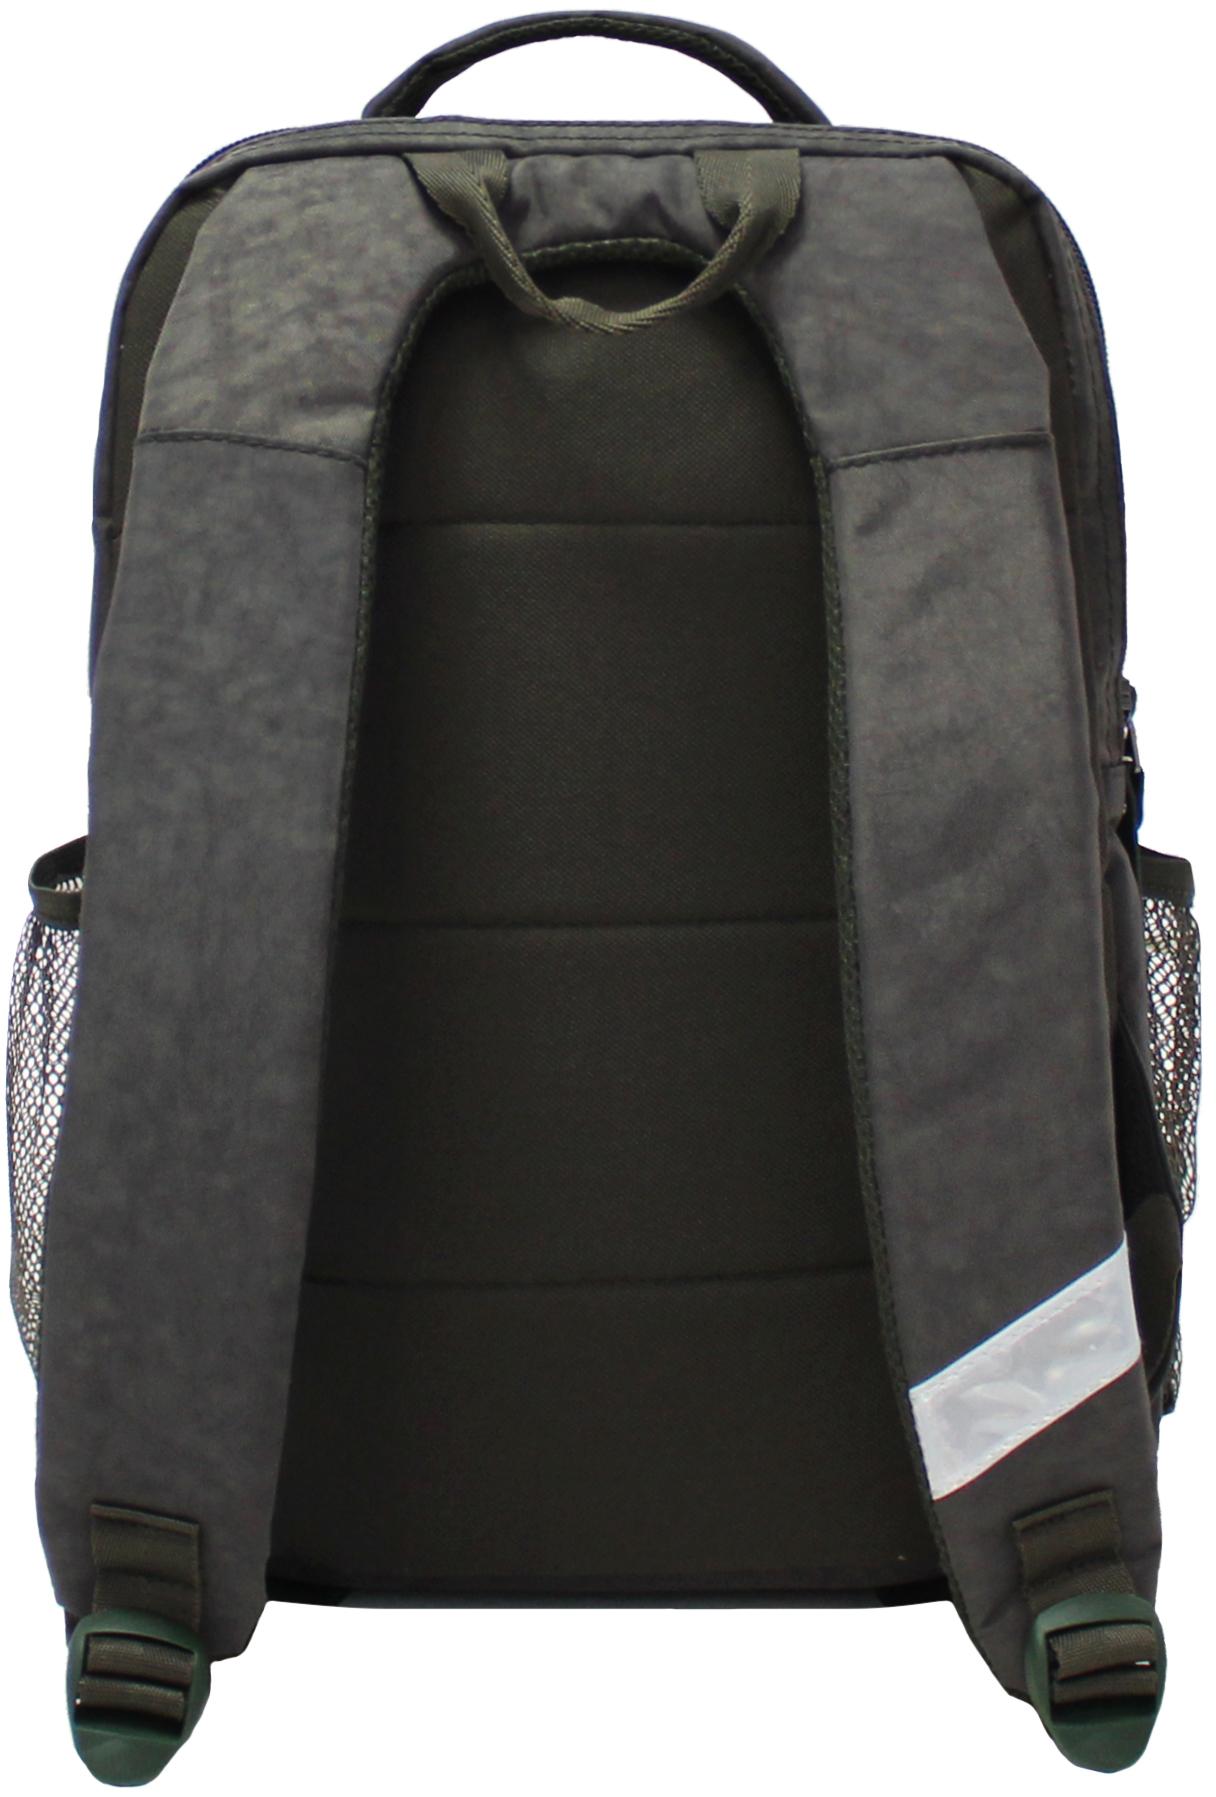 Рюкзак школьный Bagland Школьник 8 л. 327 хакі 4 м (00112702)